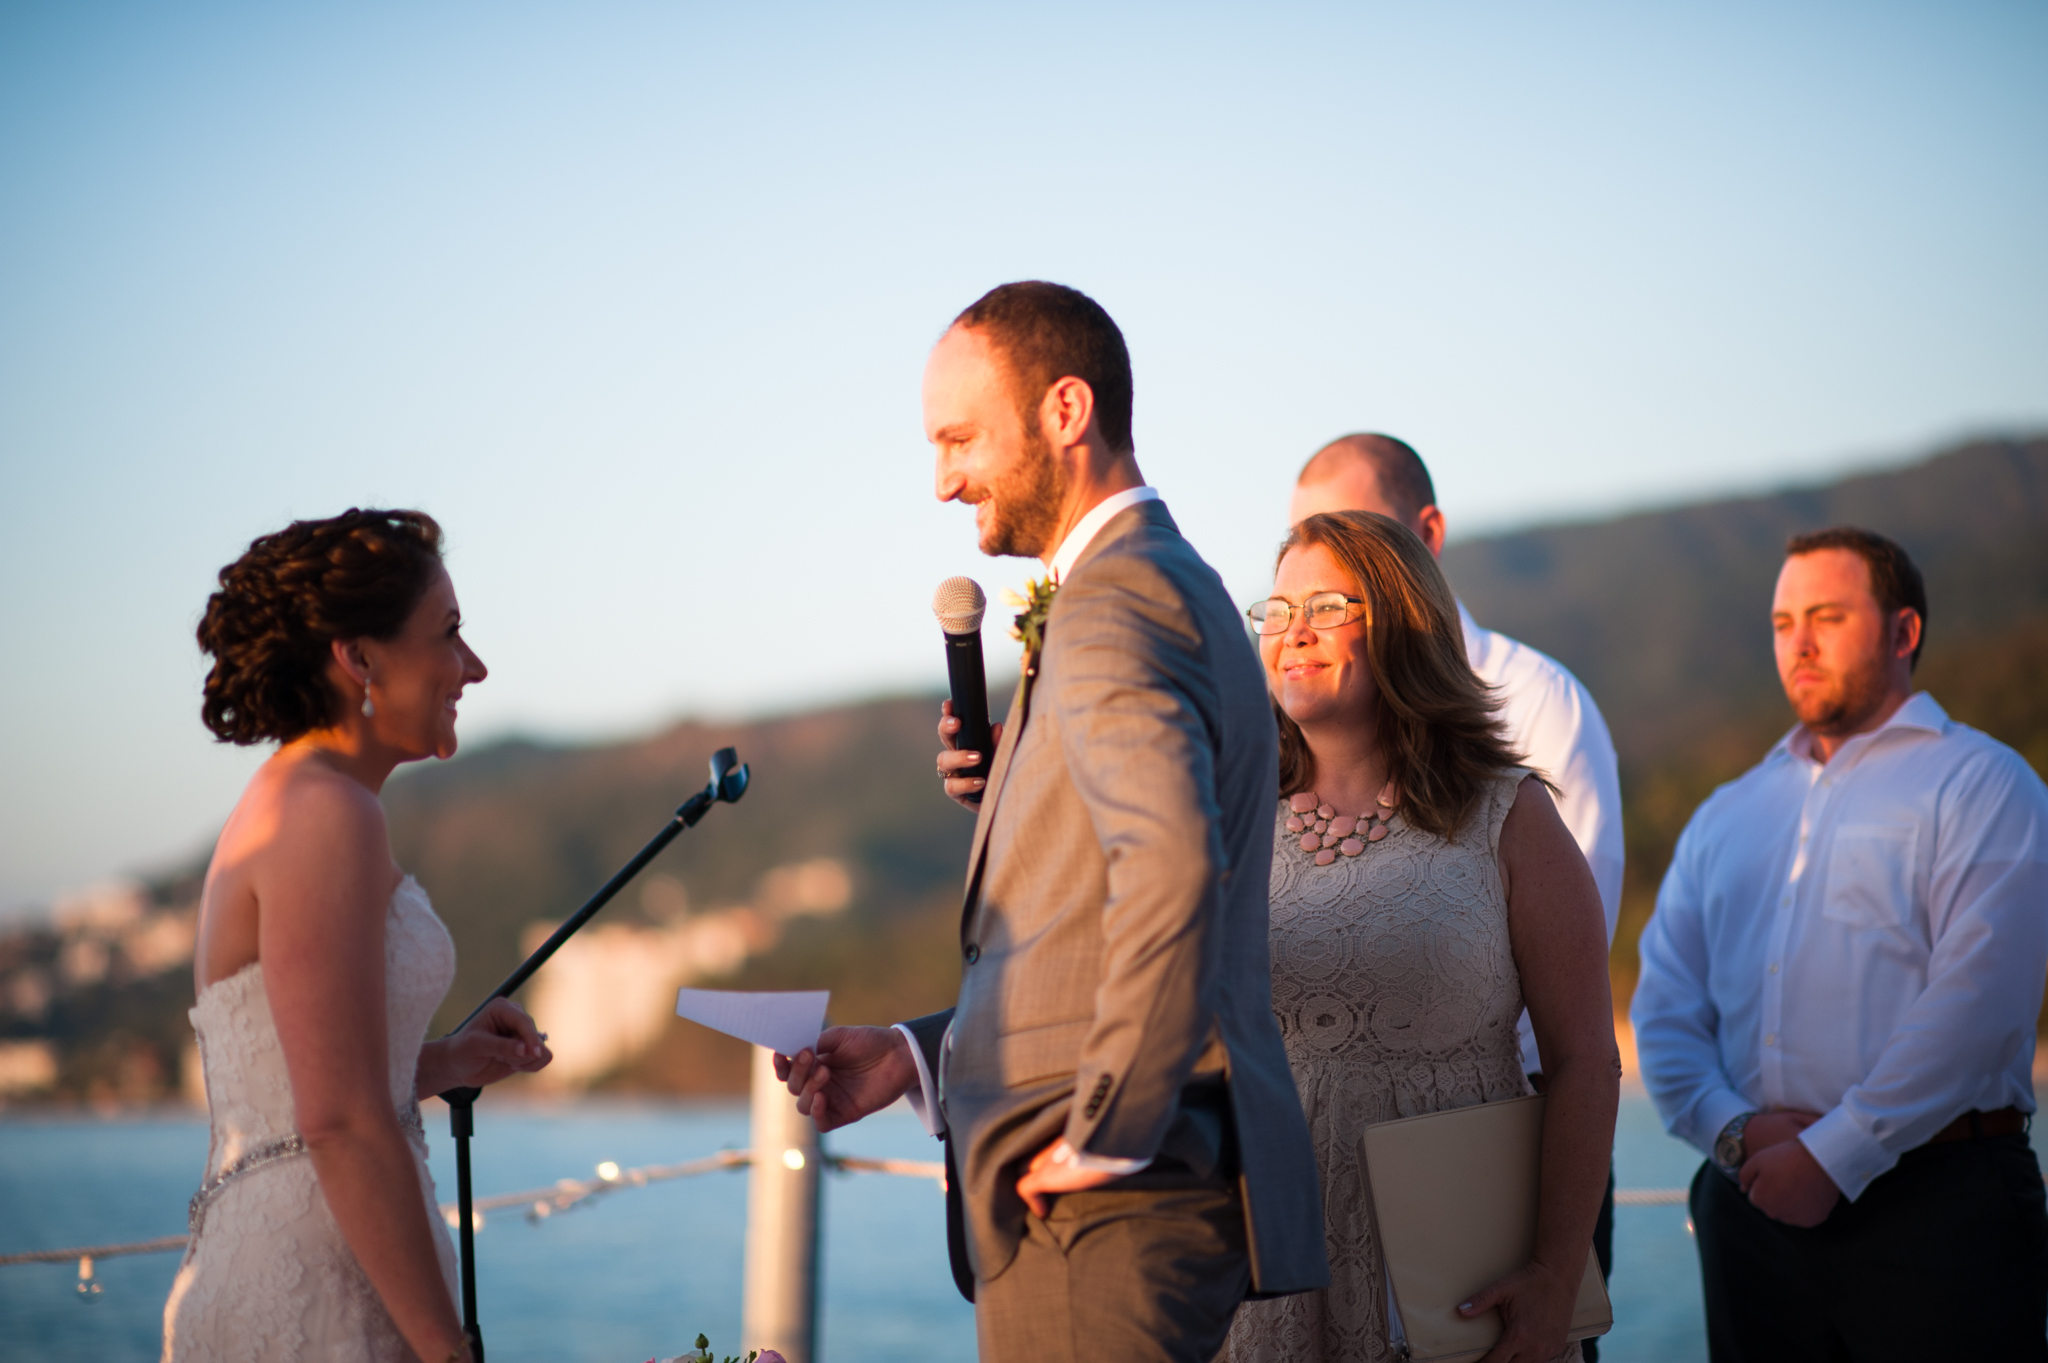 Wedding Photographer in Puerto Vallarta - Getting married on the beach